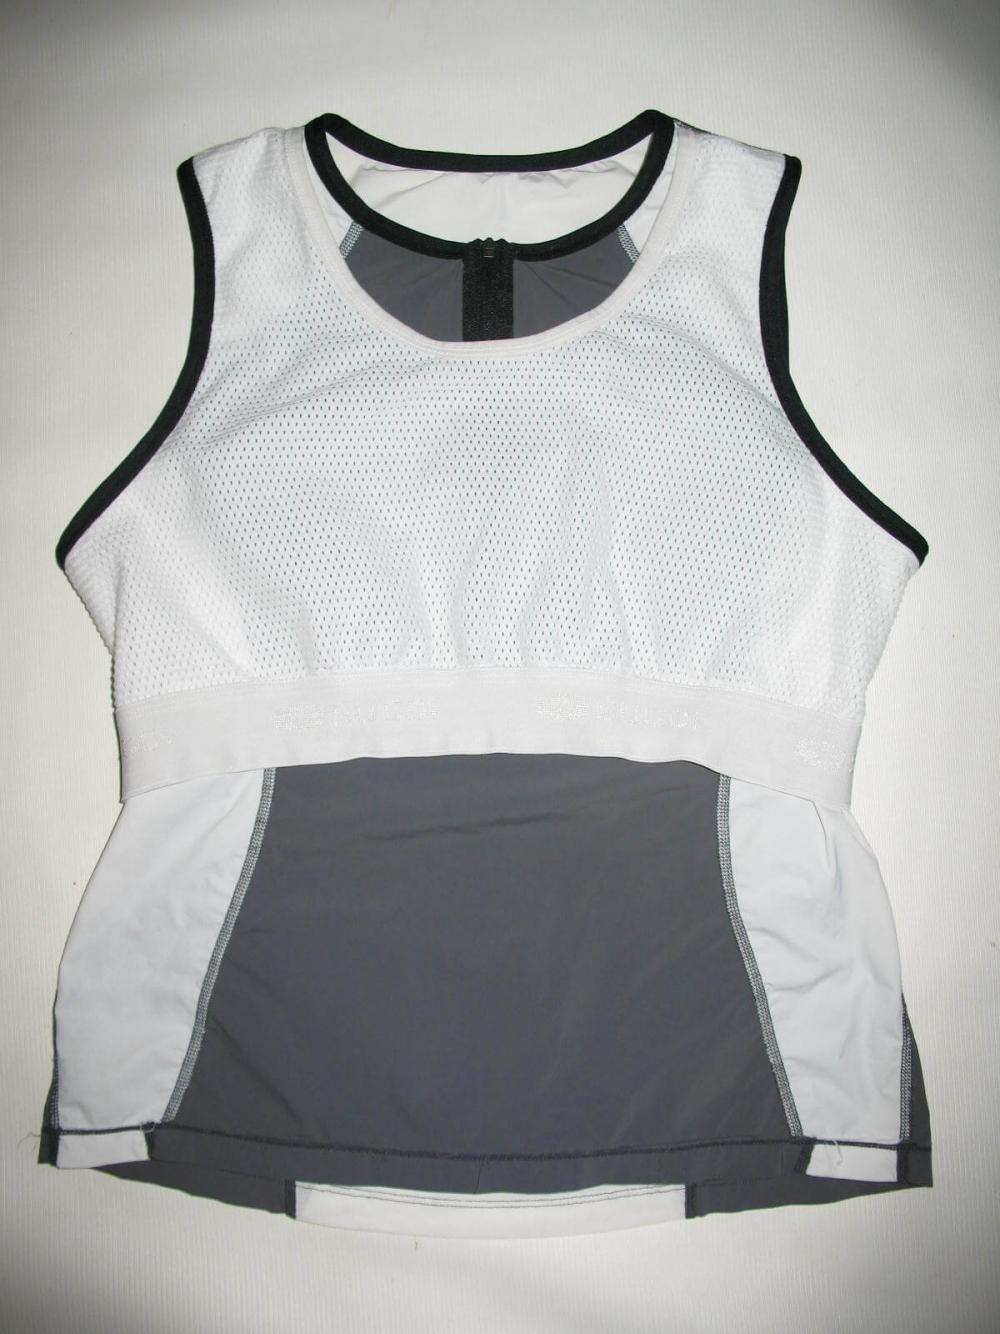 Веломайка SUGOI sleeveless triatlon jersey lady (размер L) - 5